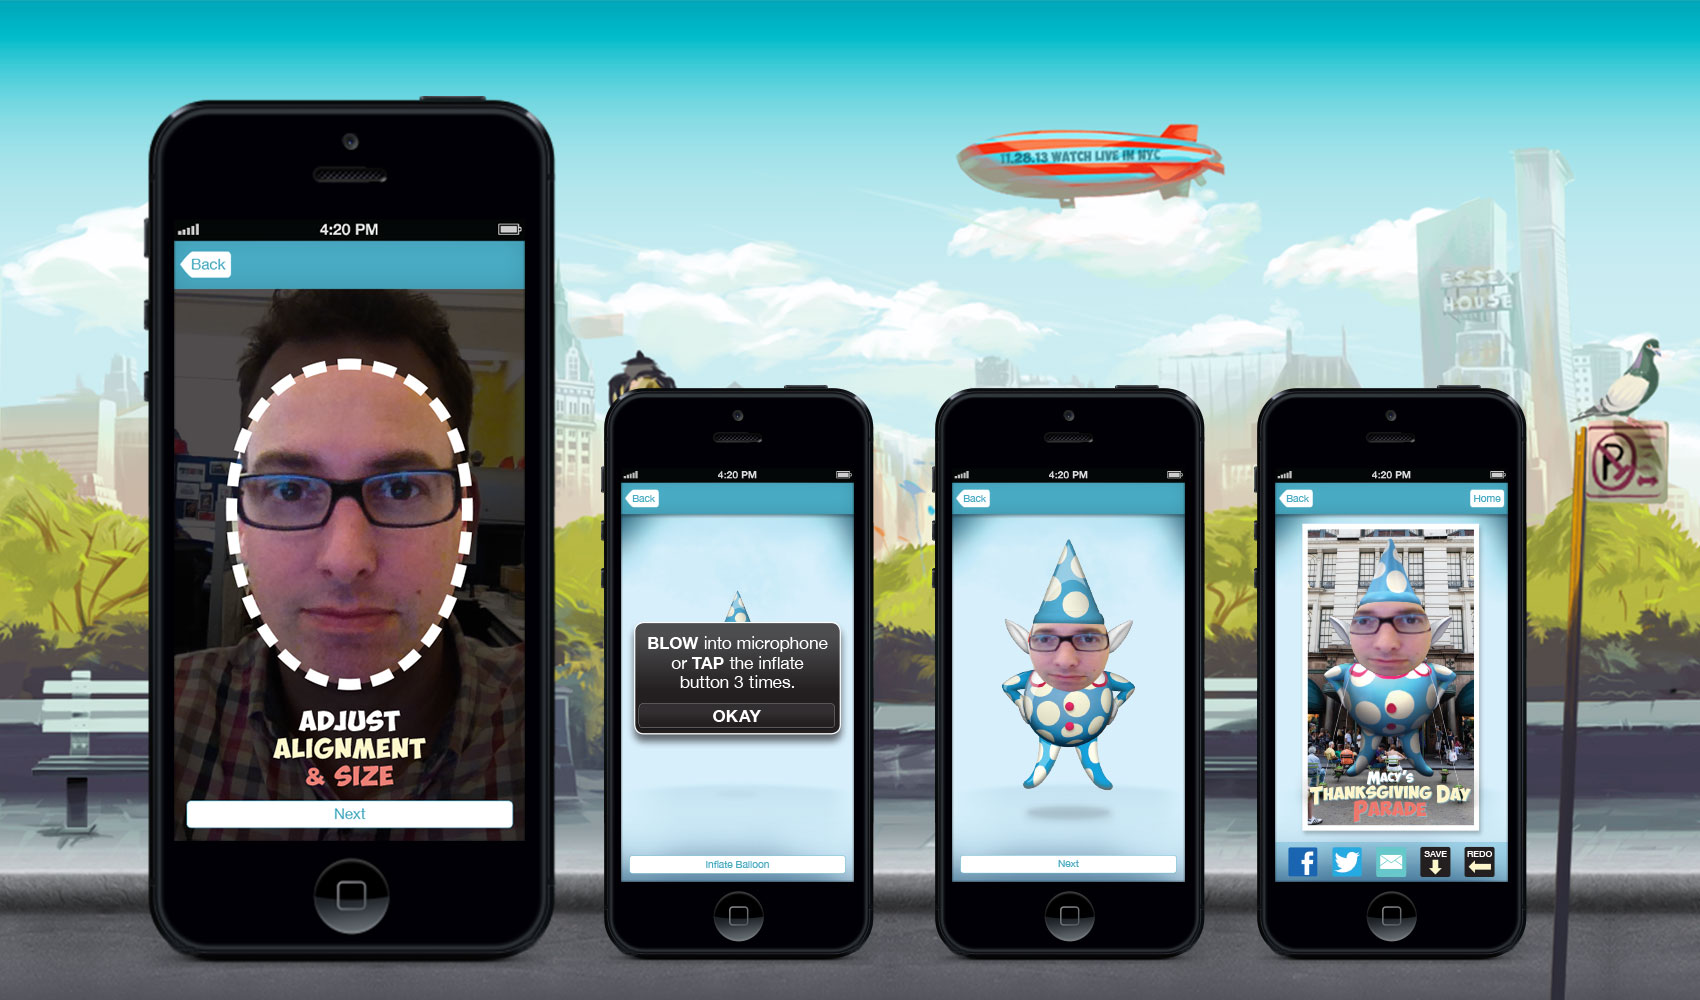 Vanguard - Mobile Application Development for Macy's